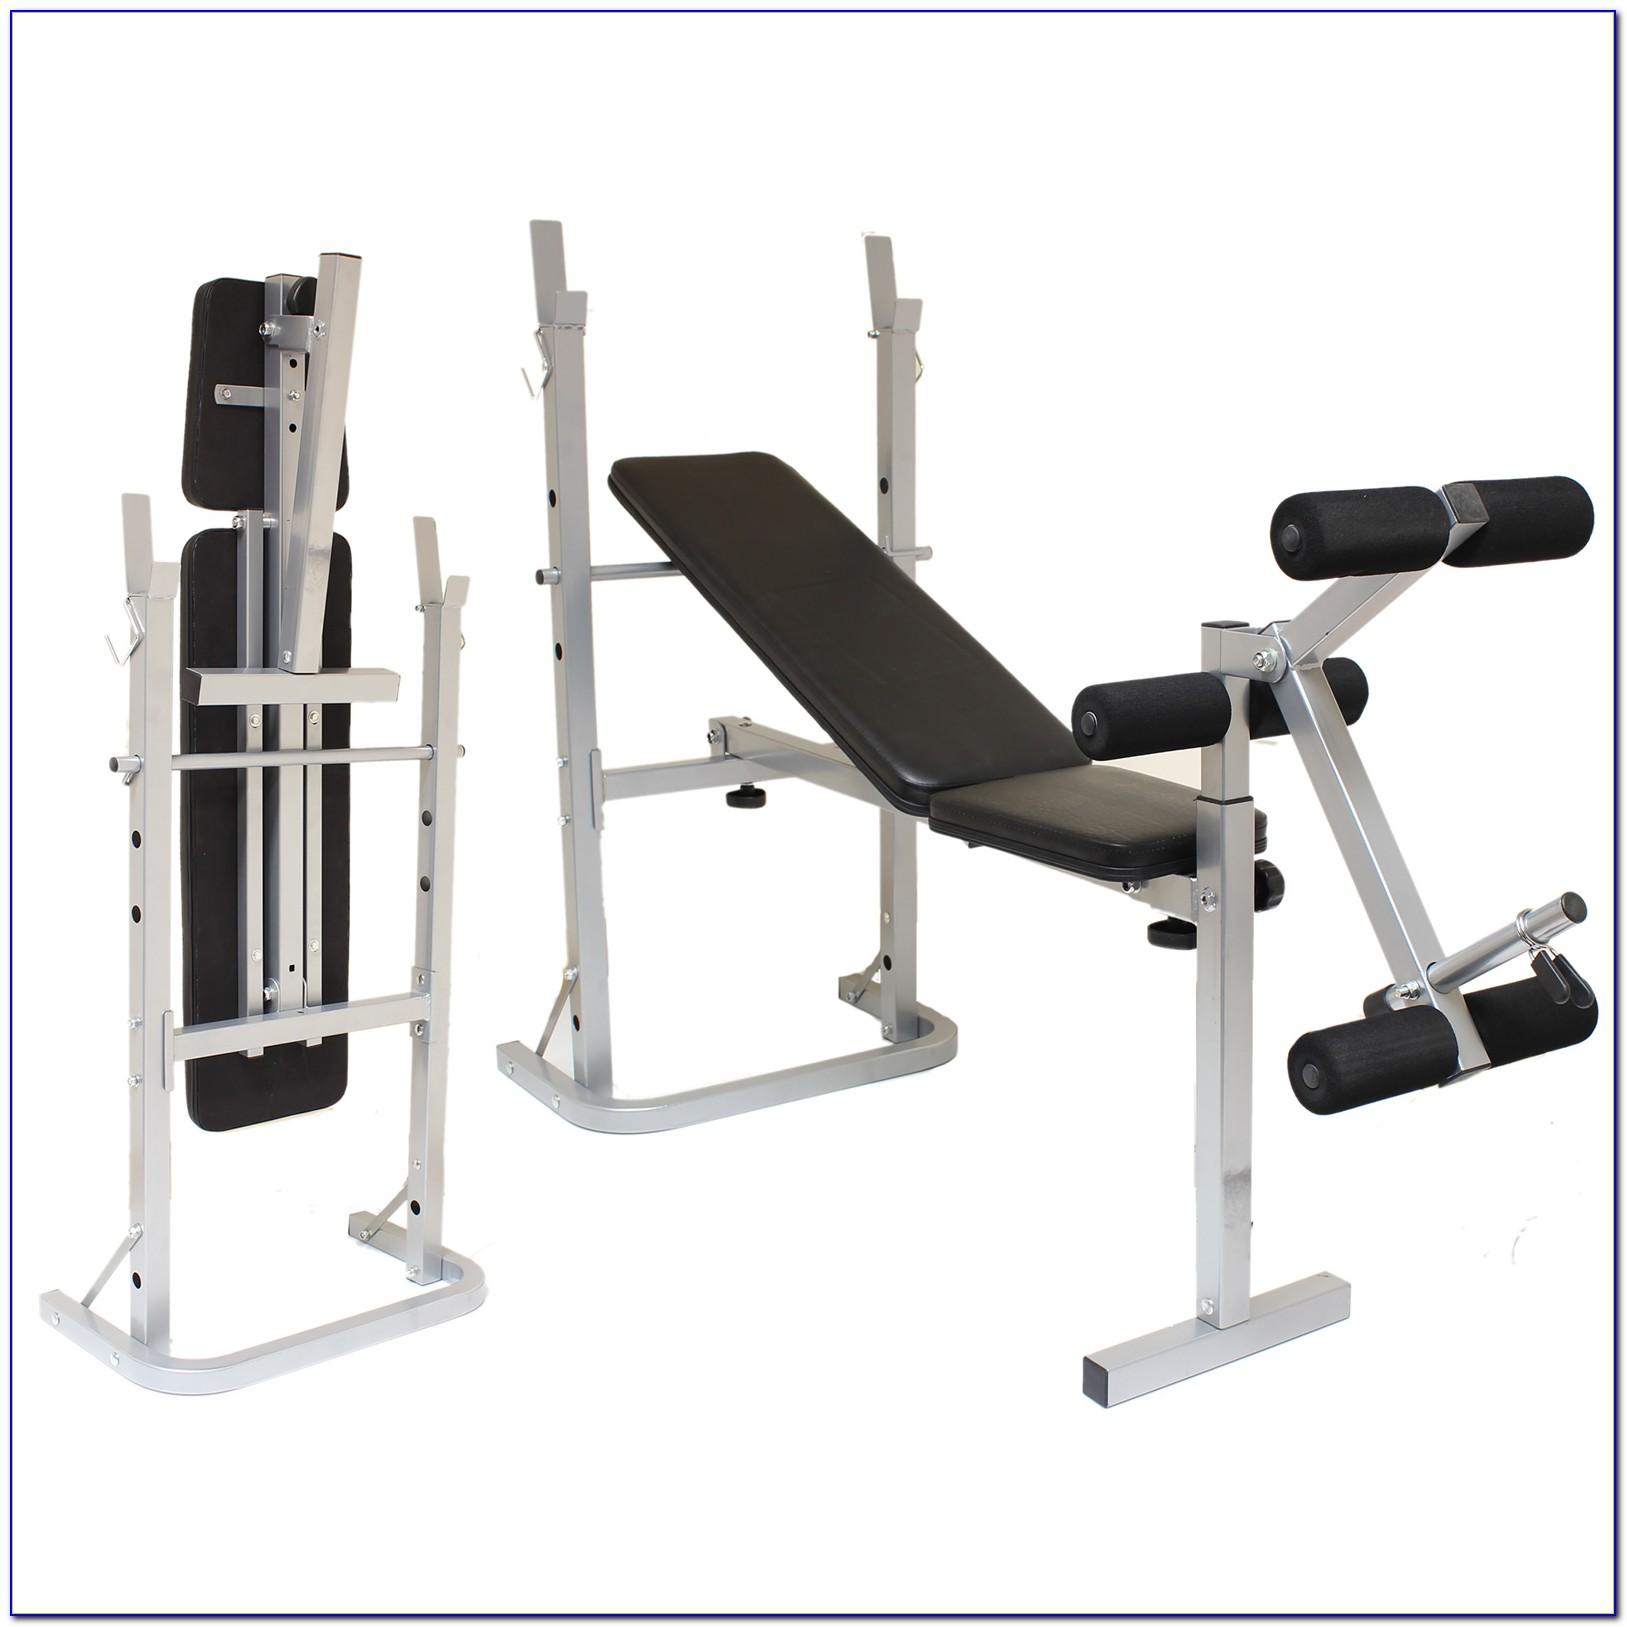 Fold Away Exercise Bench